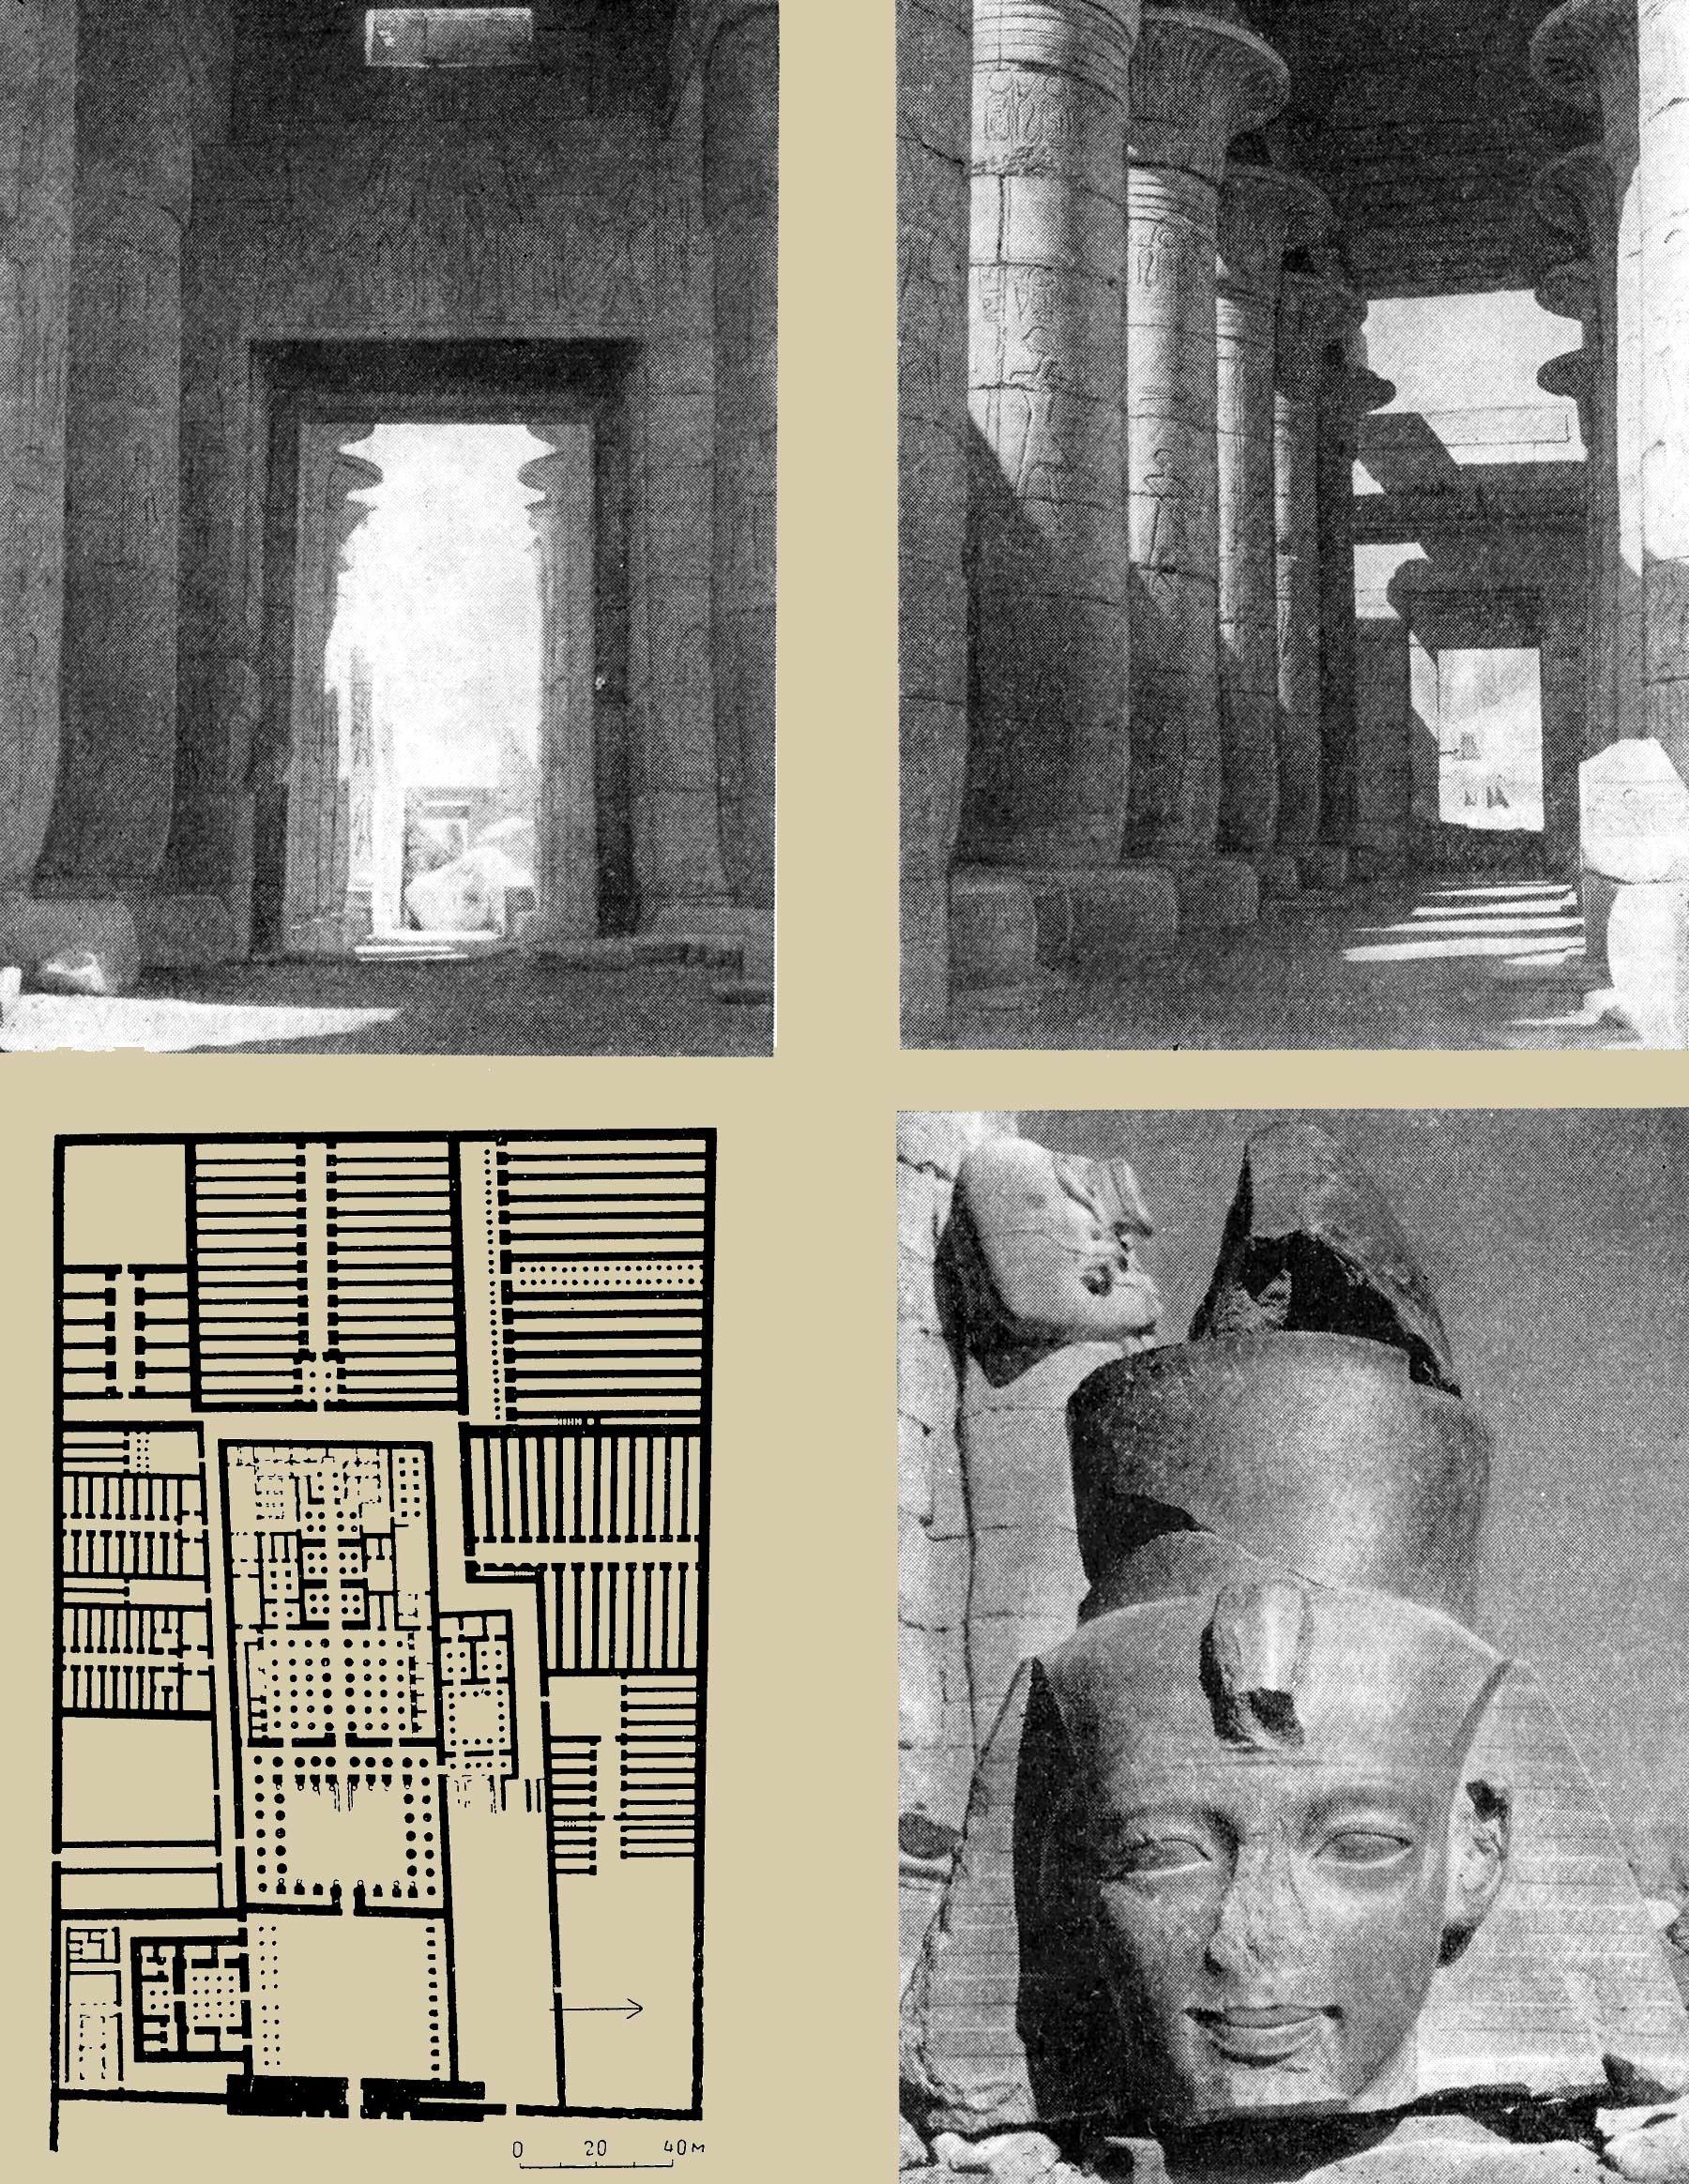 history 137 137-11 orgánica del tribunal constitucional y de los procedimientos  the world is flat 30: a brief history of the twenty-first century thomas l friedman.